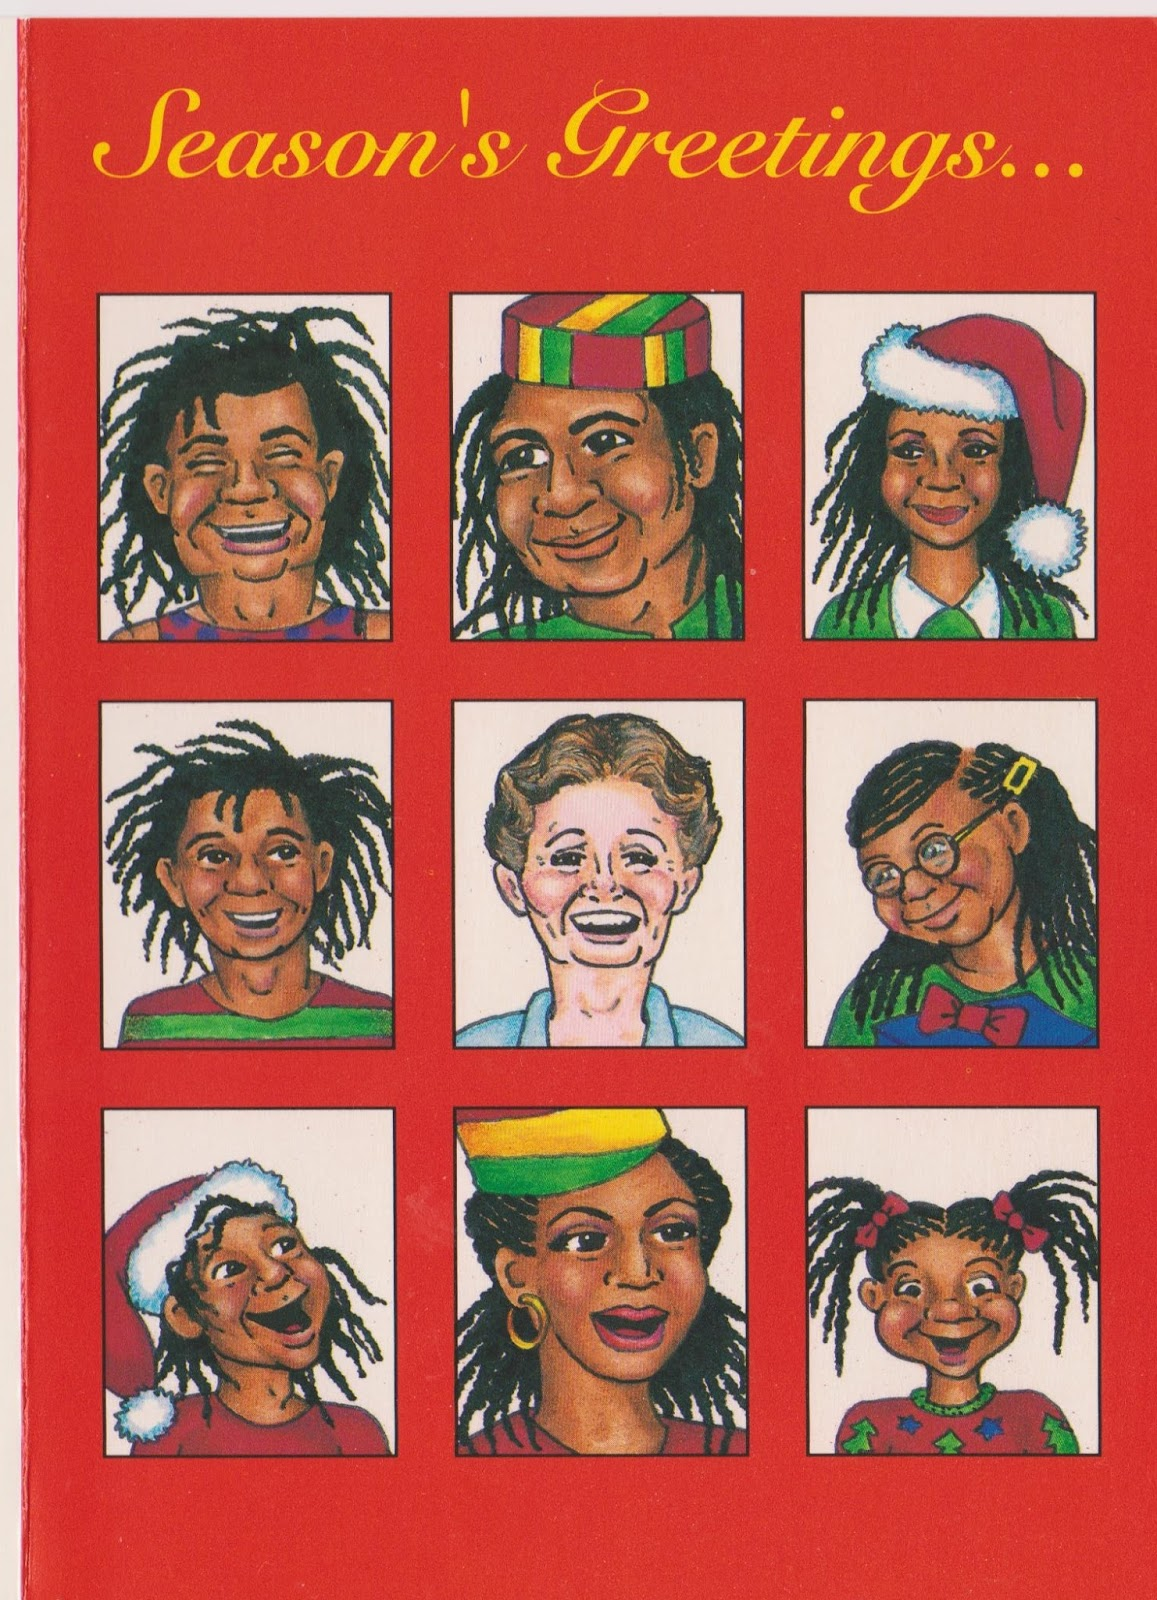 Brady Bunch Christmas Card.The Brady Bunch Blog Christmas Card Late 1980s